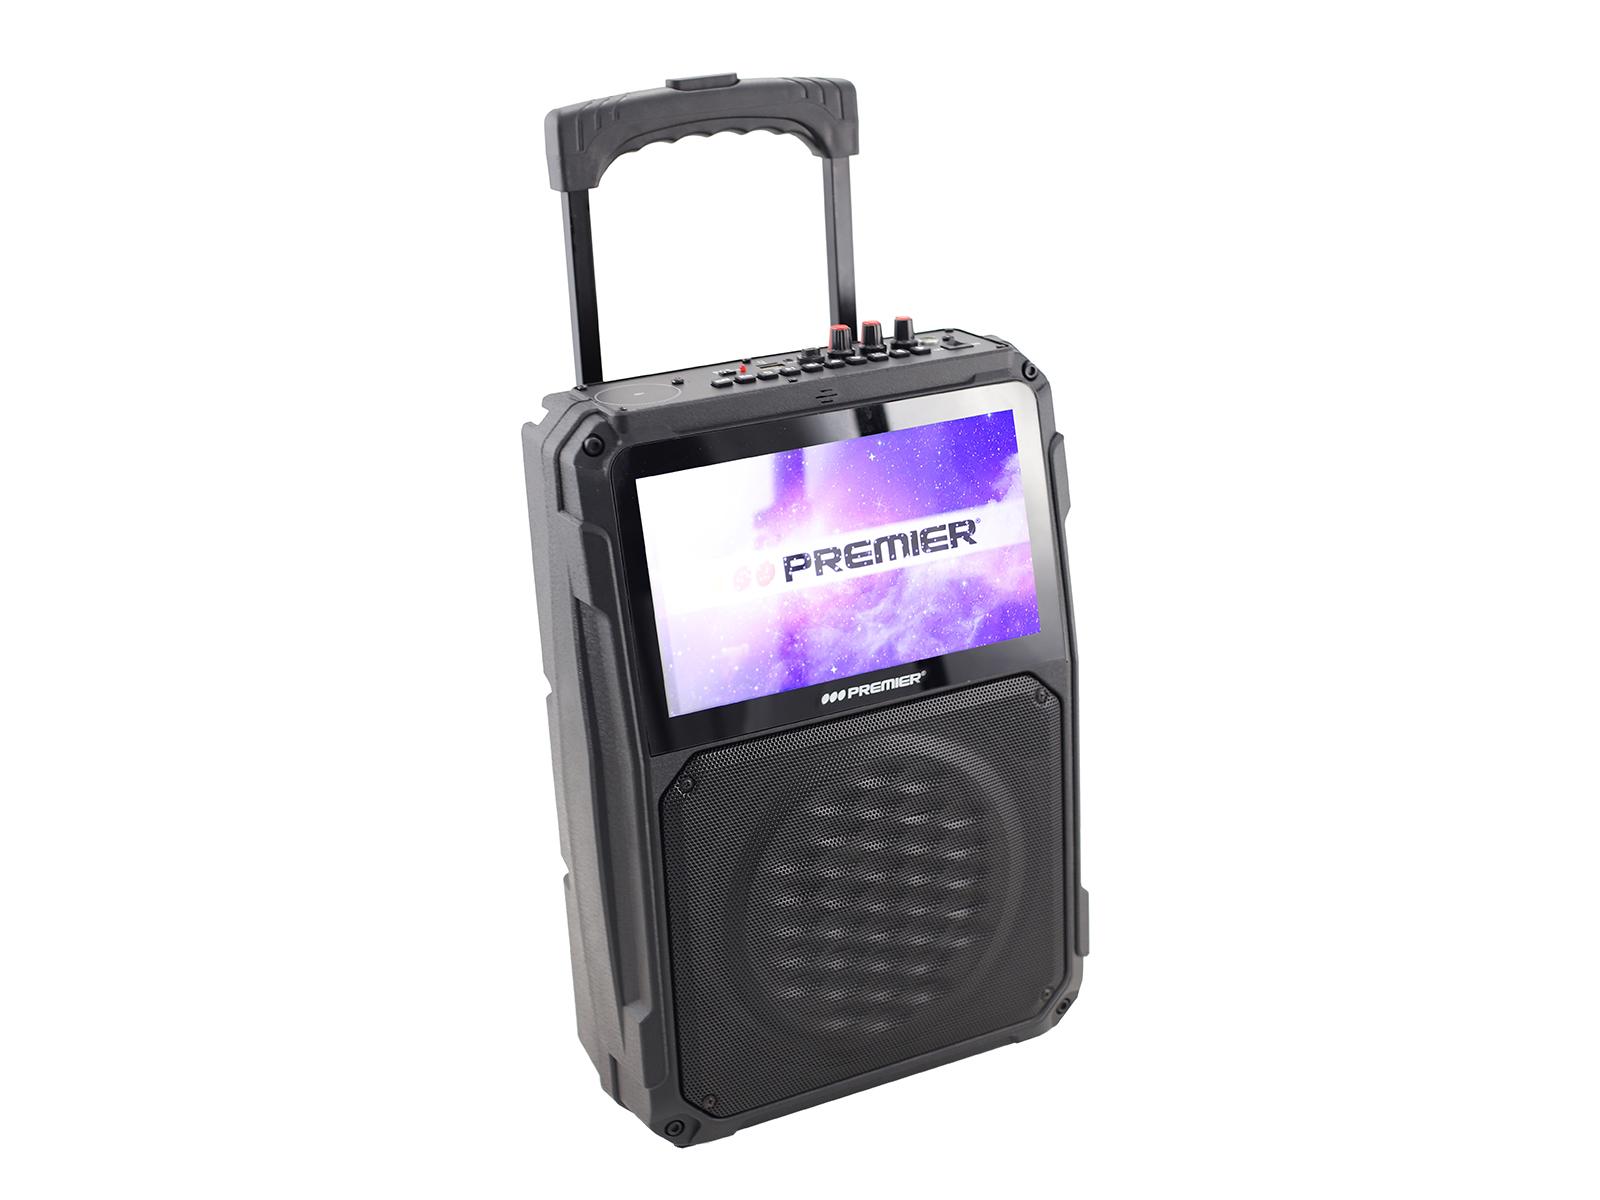 Imagen de producto Sistema portátil de karaoke con dvbt2 0